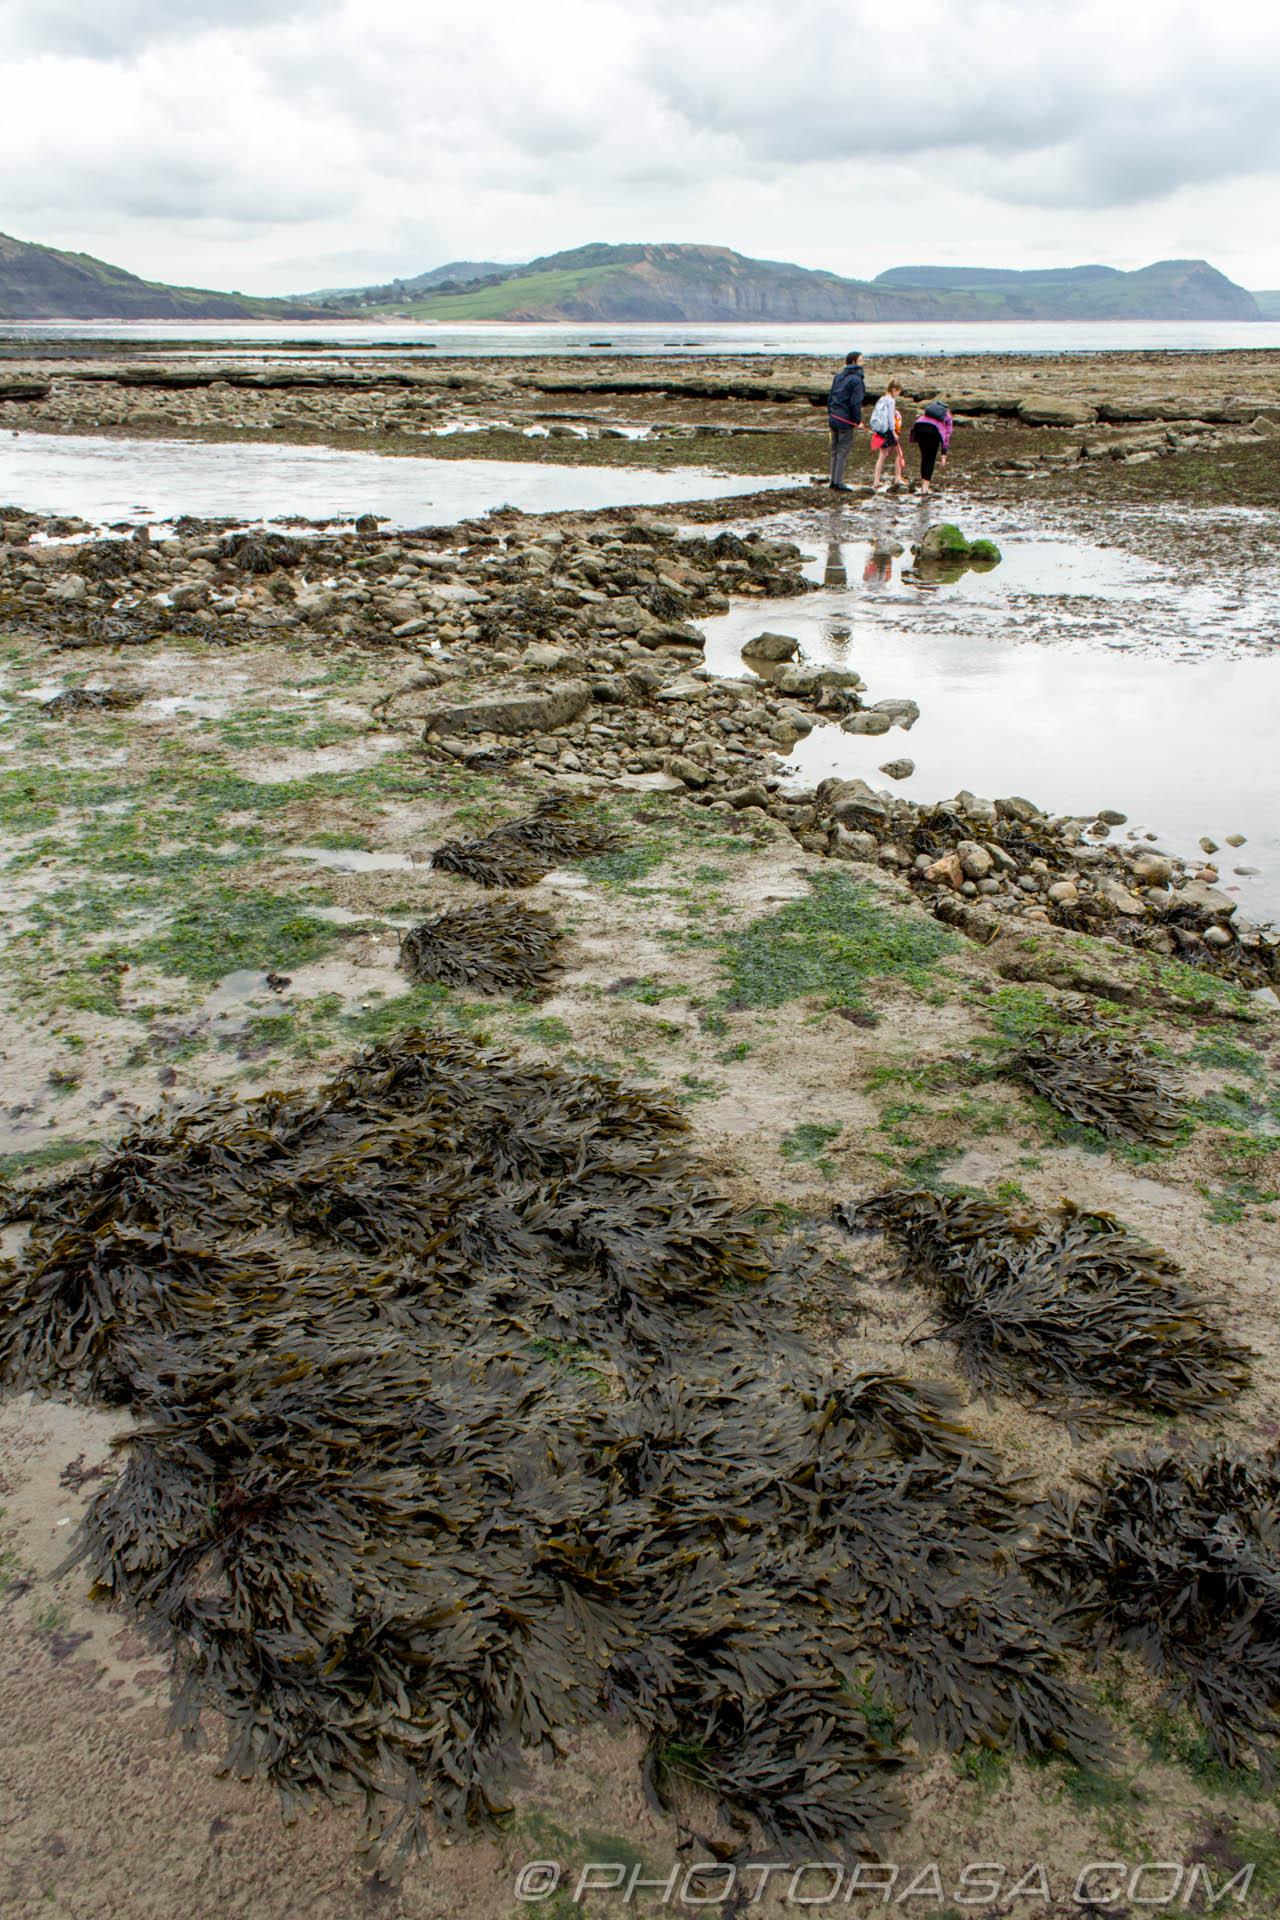 http://photorasa.com/jurassic-coast-lyme-regis/seaweed/